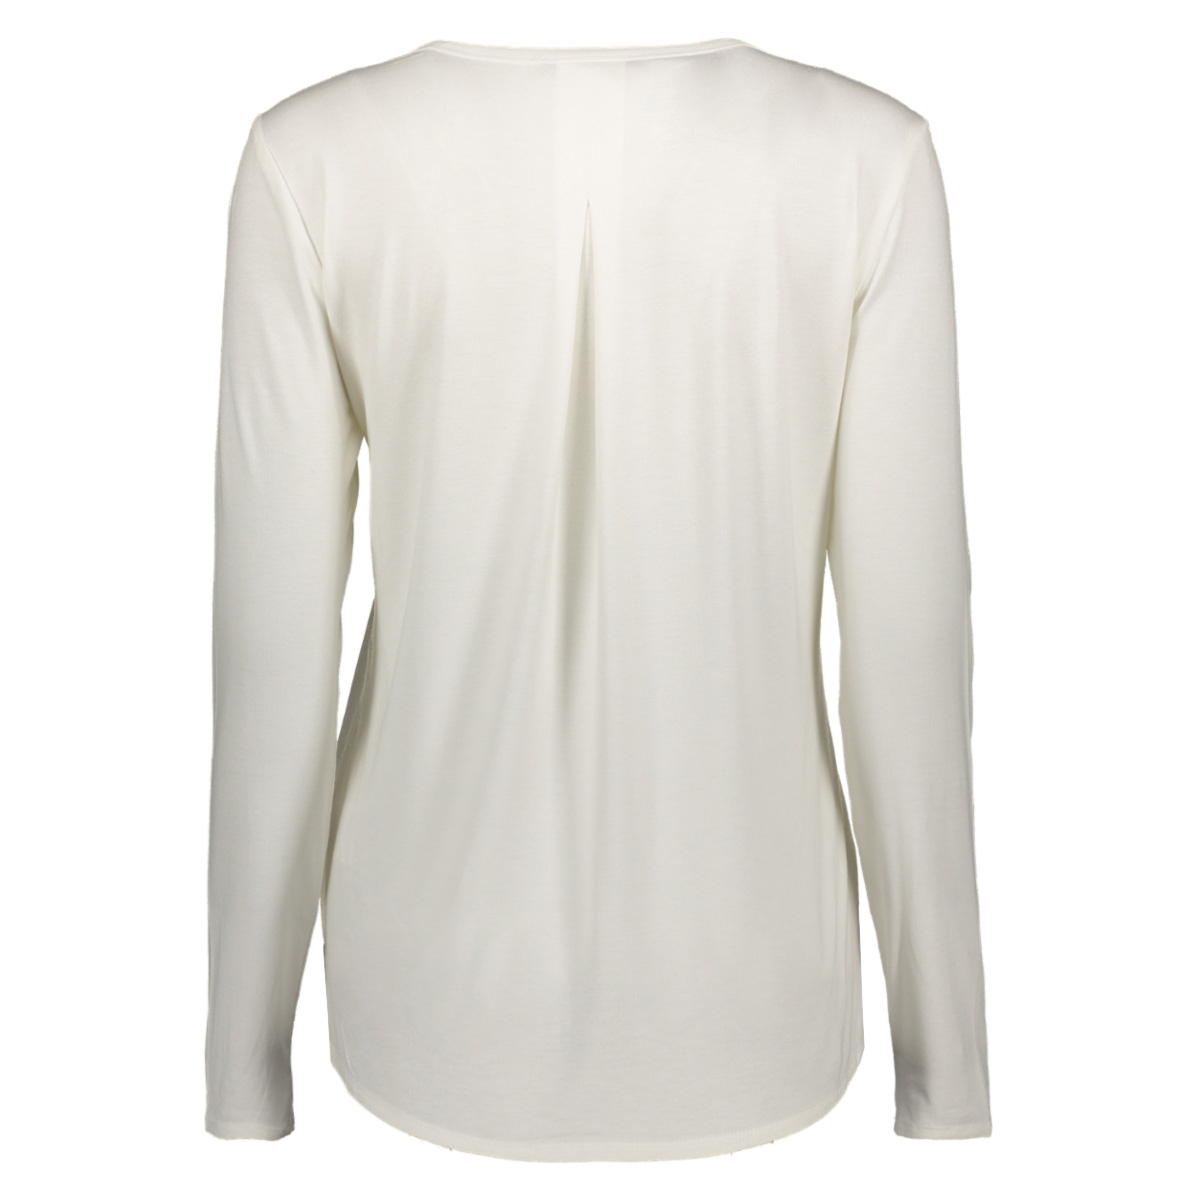 blouse 0320 0900 smith & soul blouse 104 off white